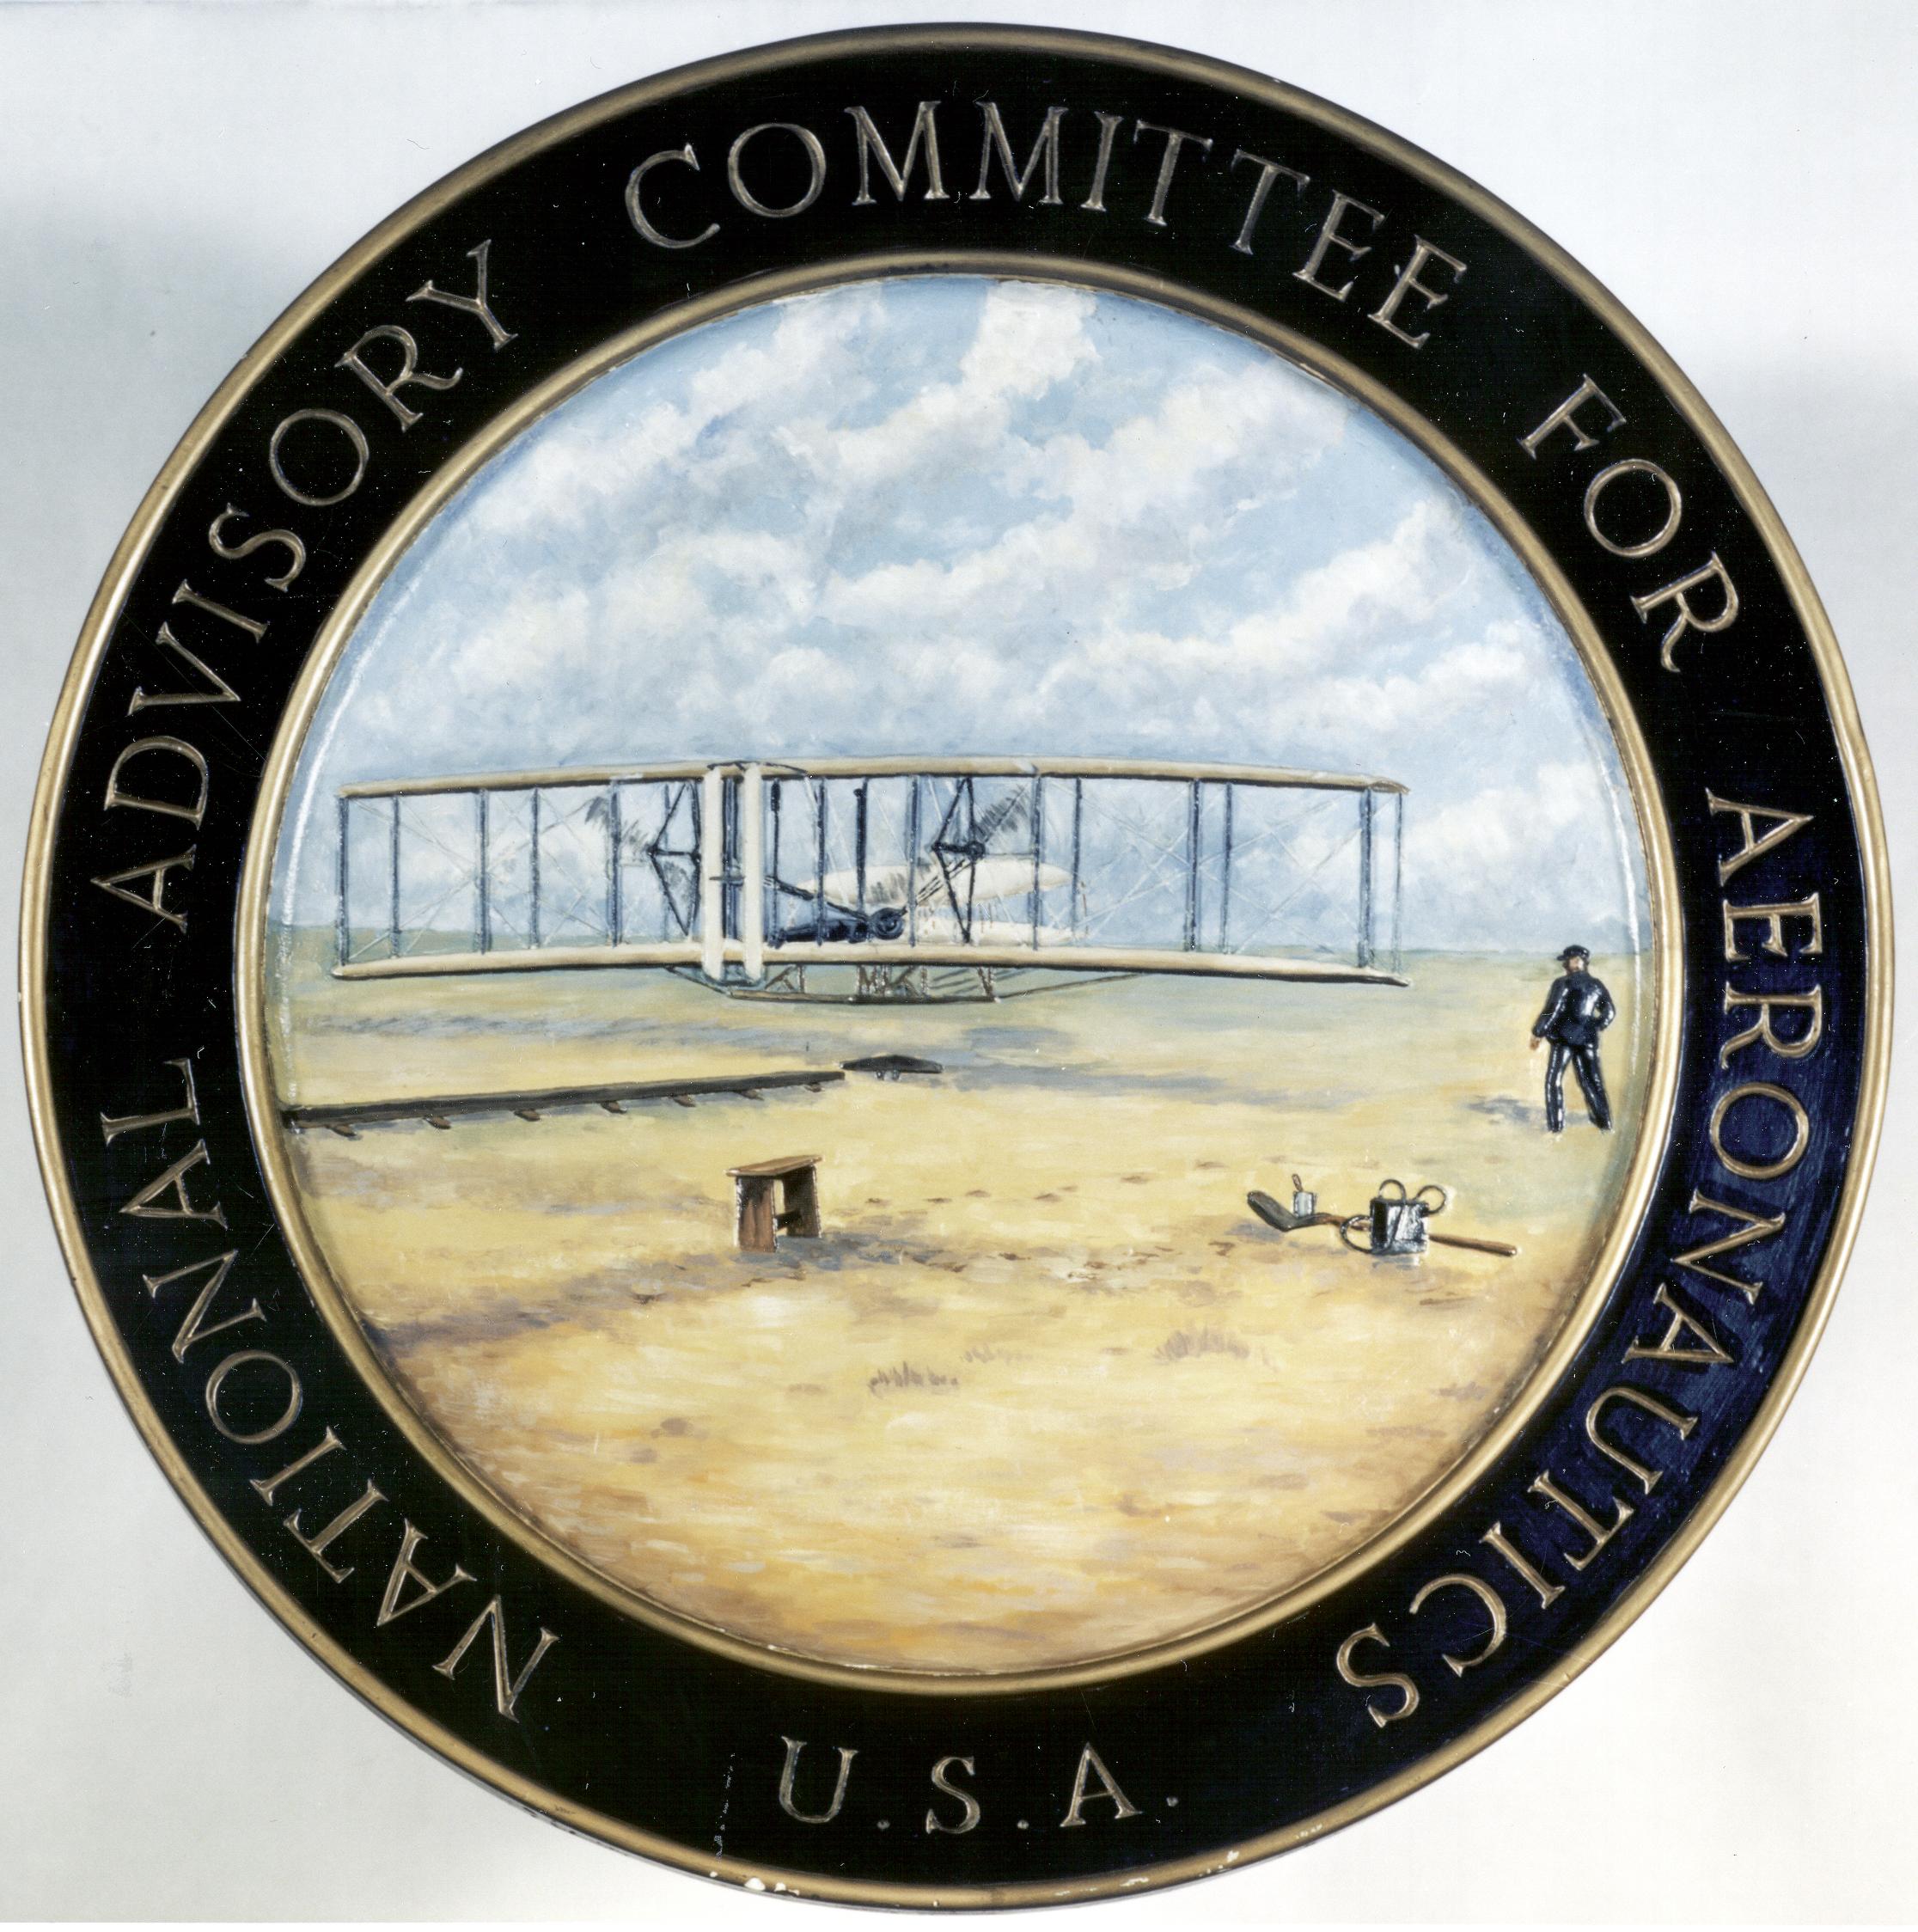 National Advisory Committee for Aeronautics - Wikiwand